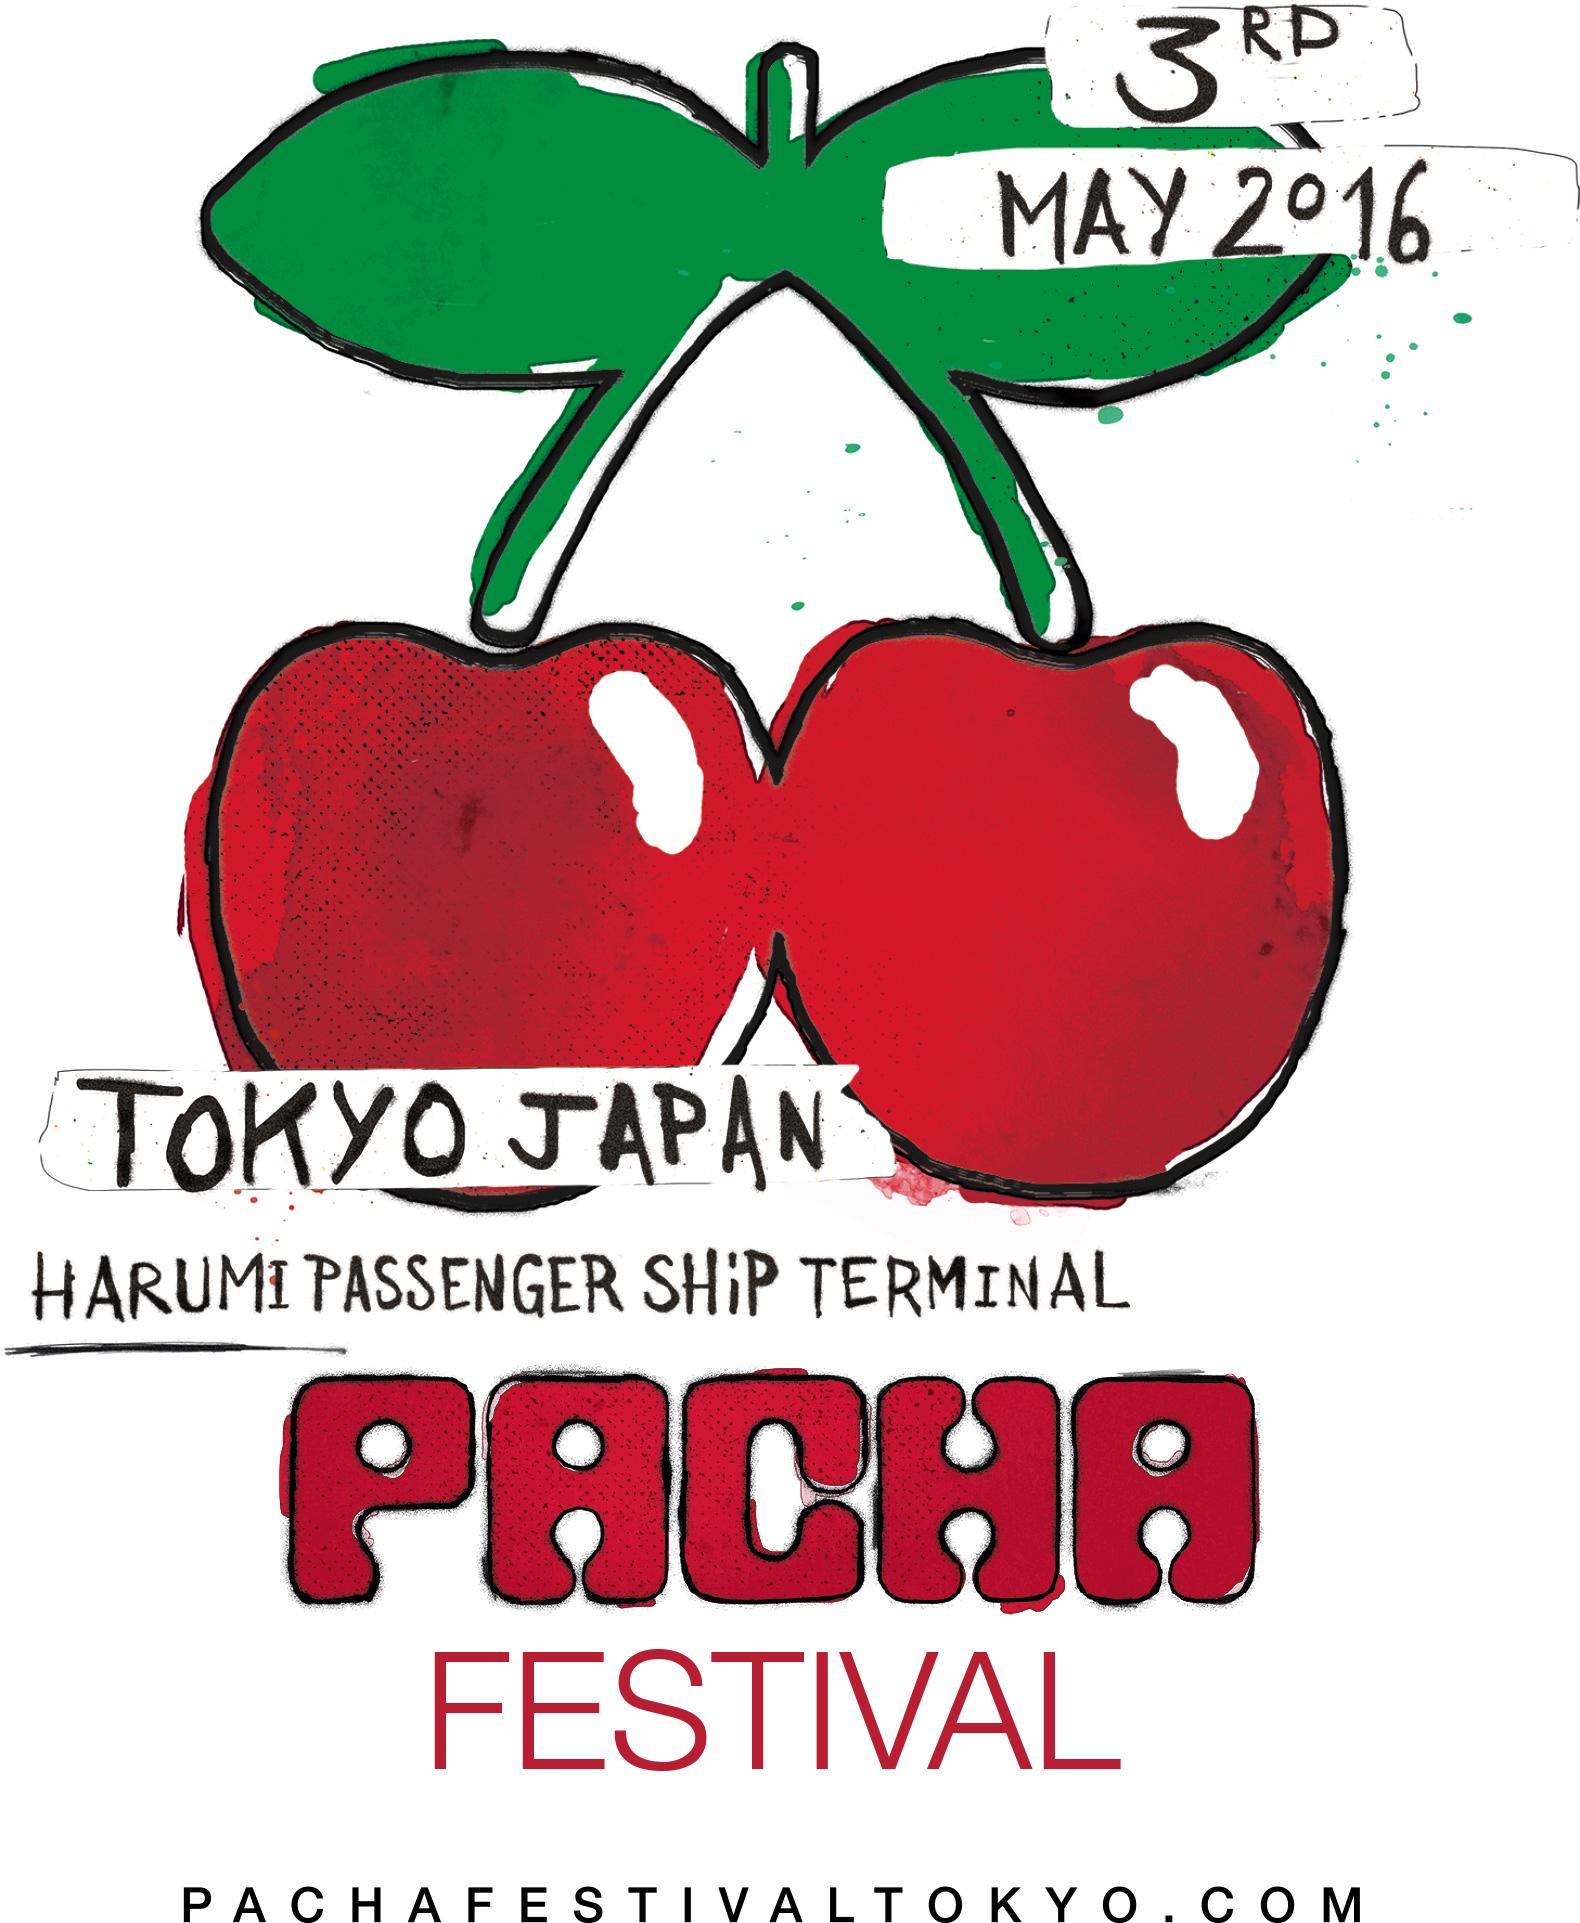 PACHA FESTIVAL TOKYO 2016 logo